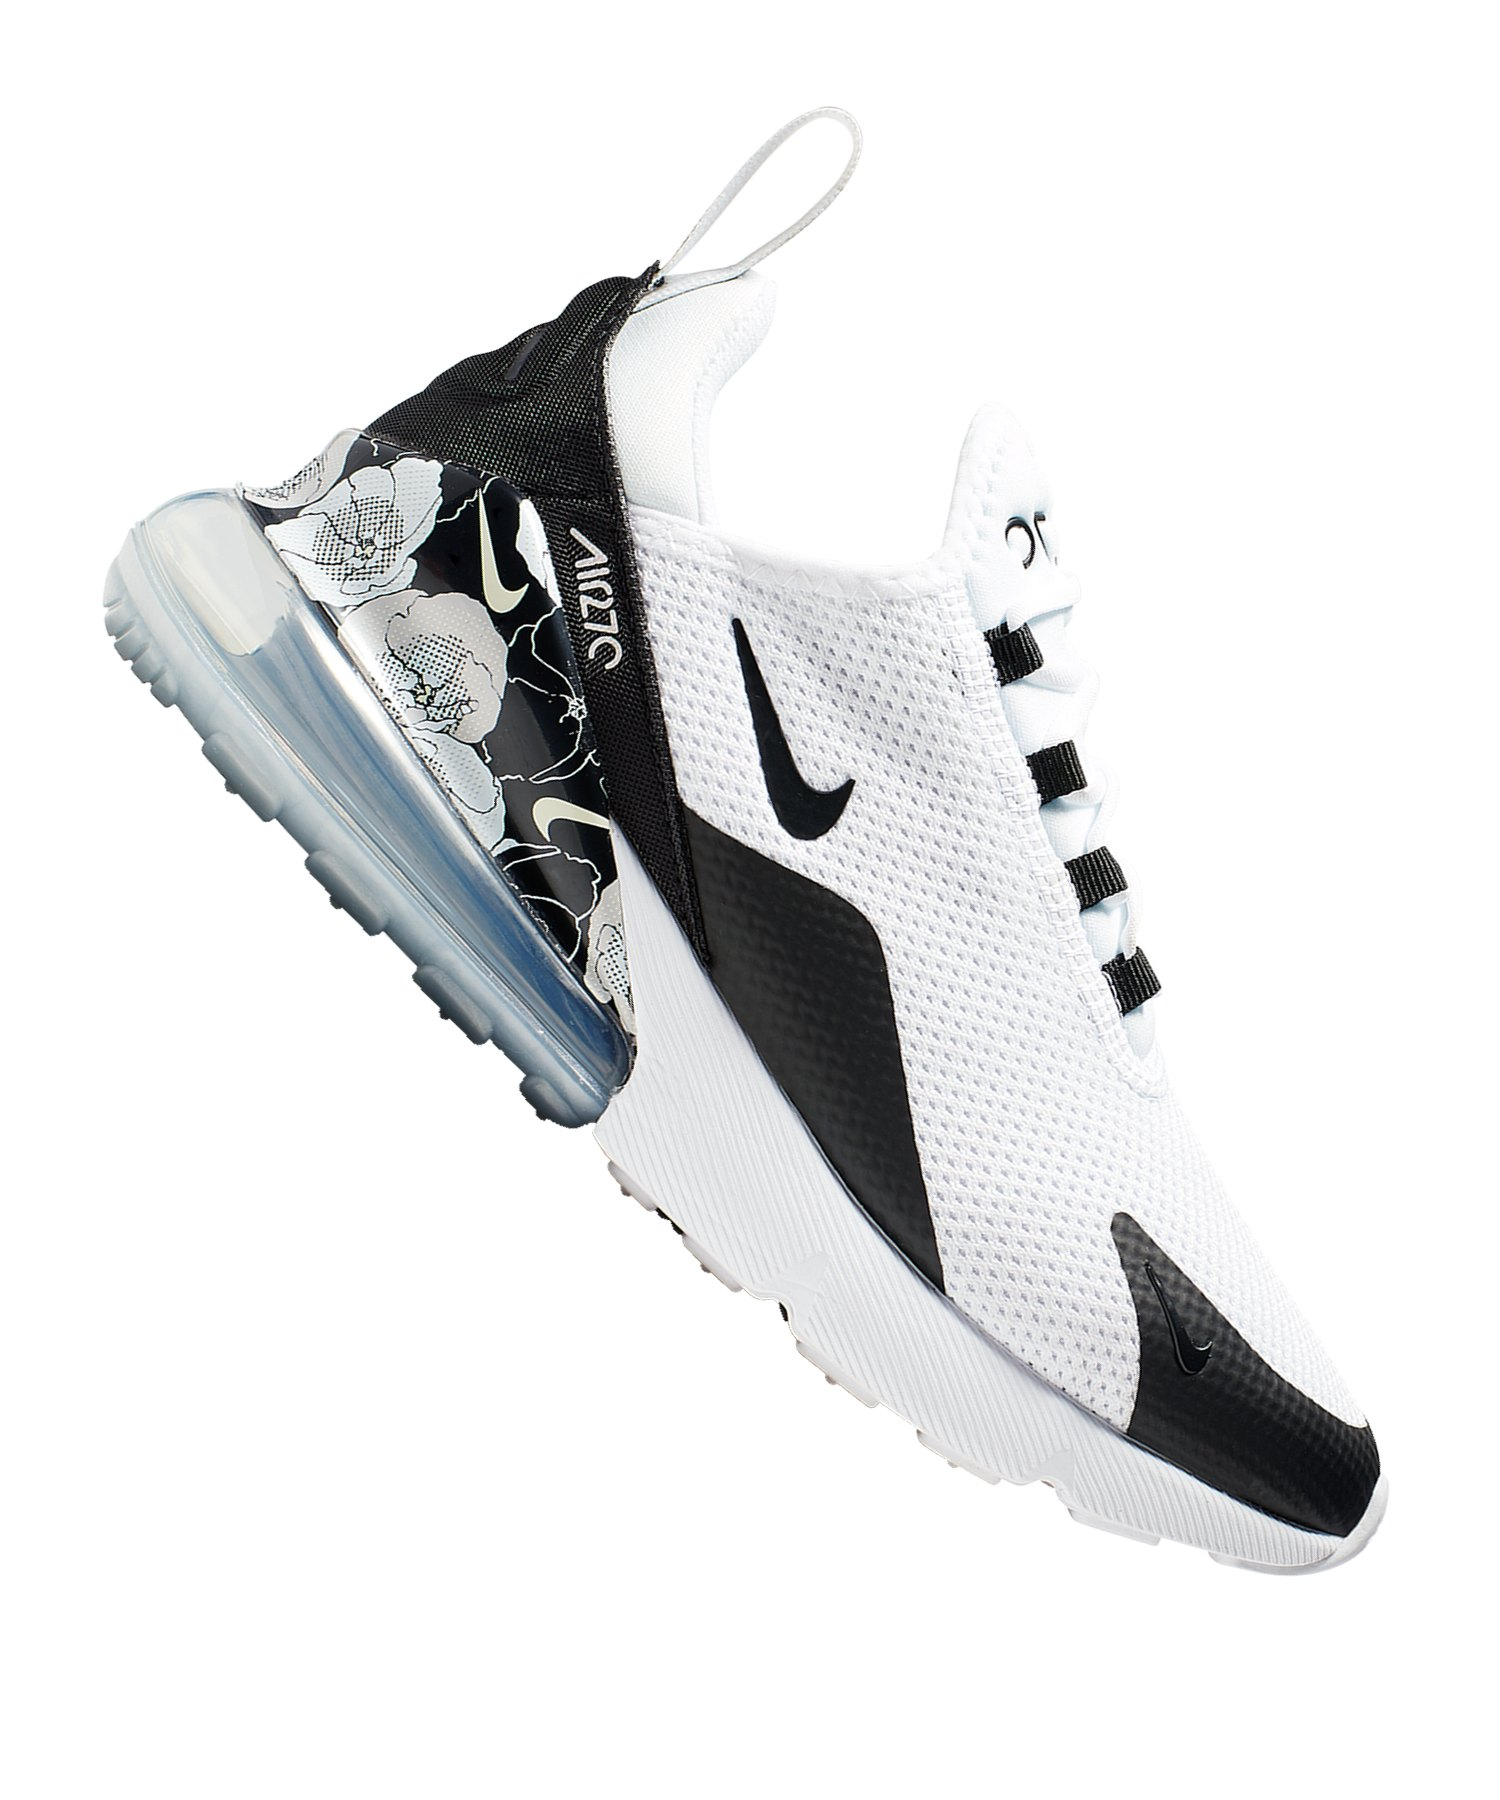 Details zu Nike Air Max 270 SE Herren Sneaker AQ9164 005 Anthrazit Schuhe Turnschuhe NEU